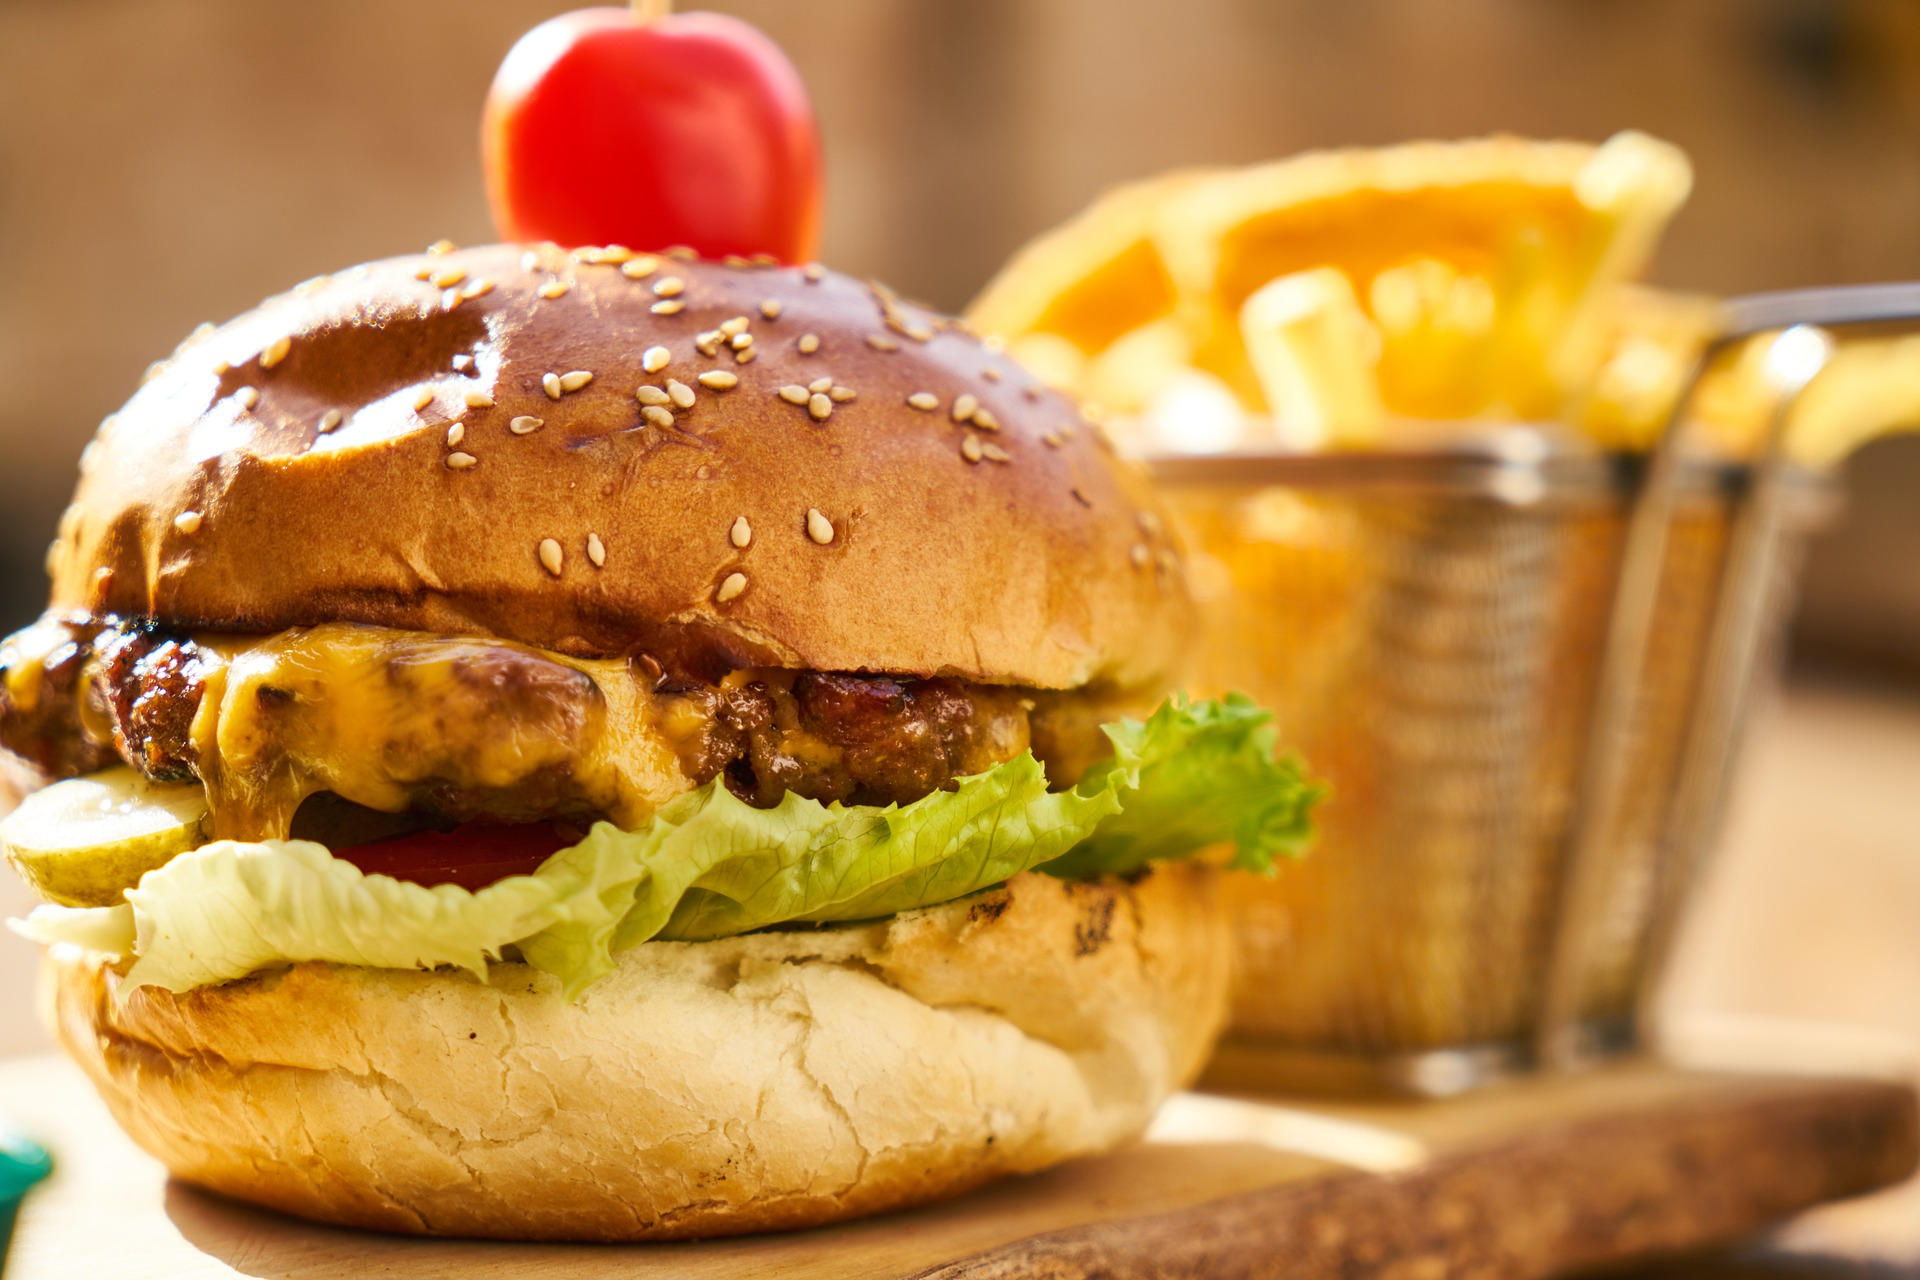 burger-4220759_1920.jpg